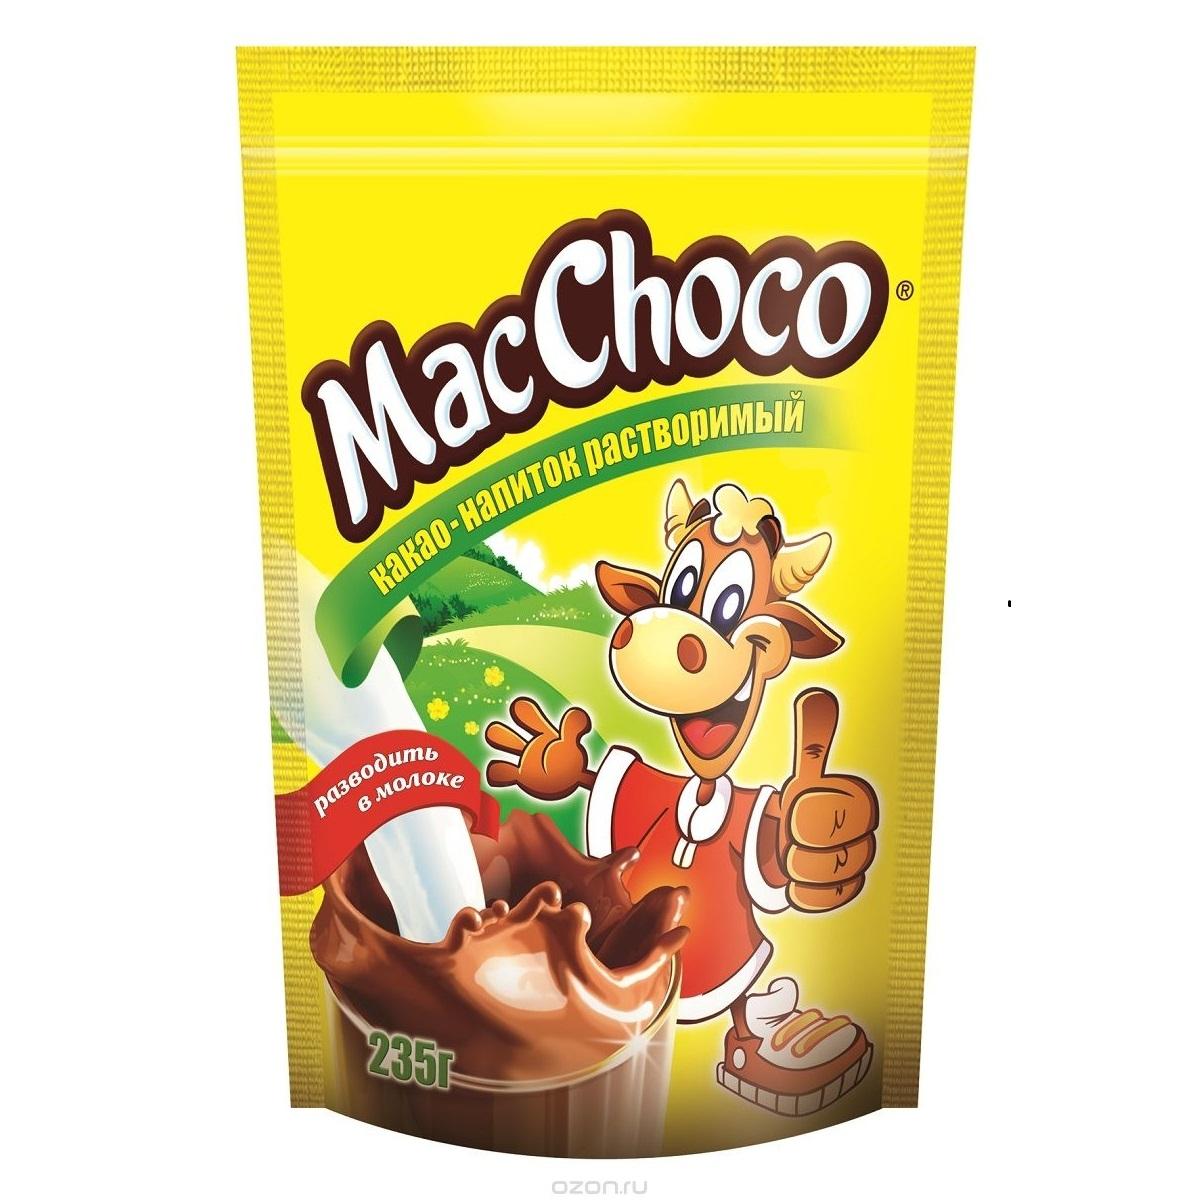 Какао-напиток растворимый  MacChoco  235гр.